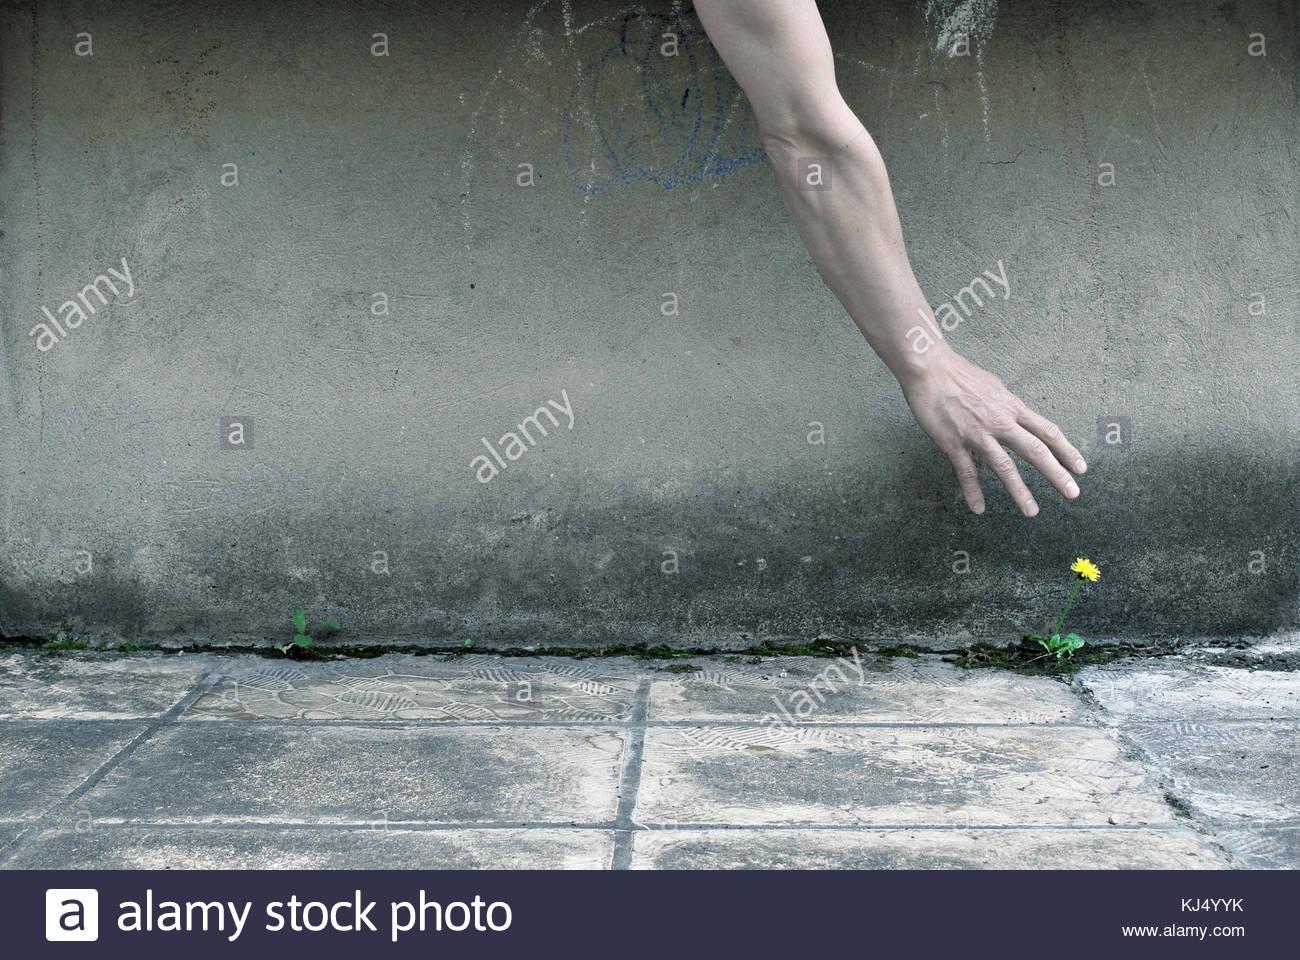 hand picking up - Stock Image